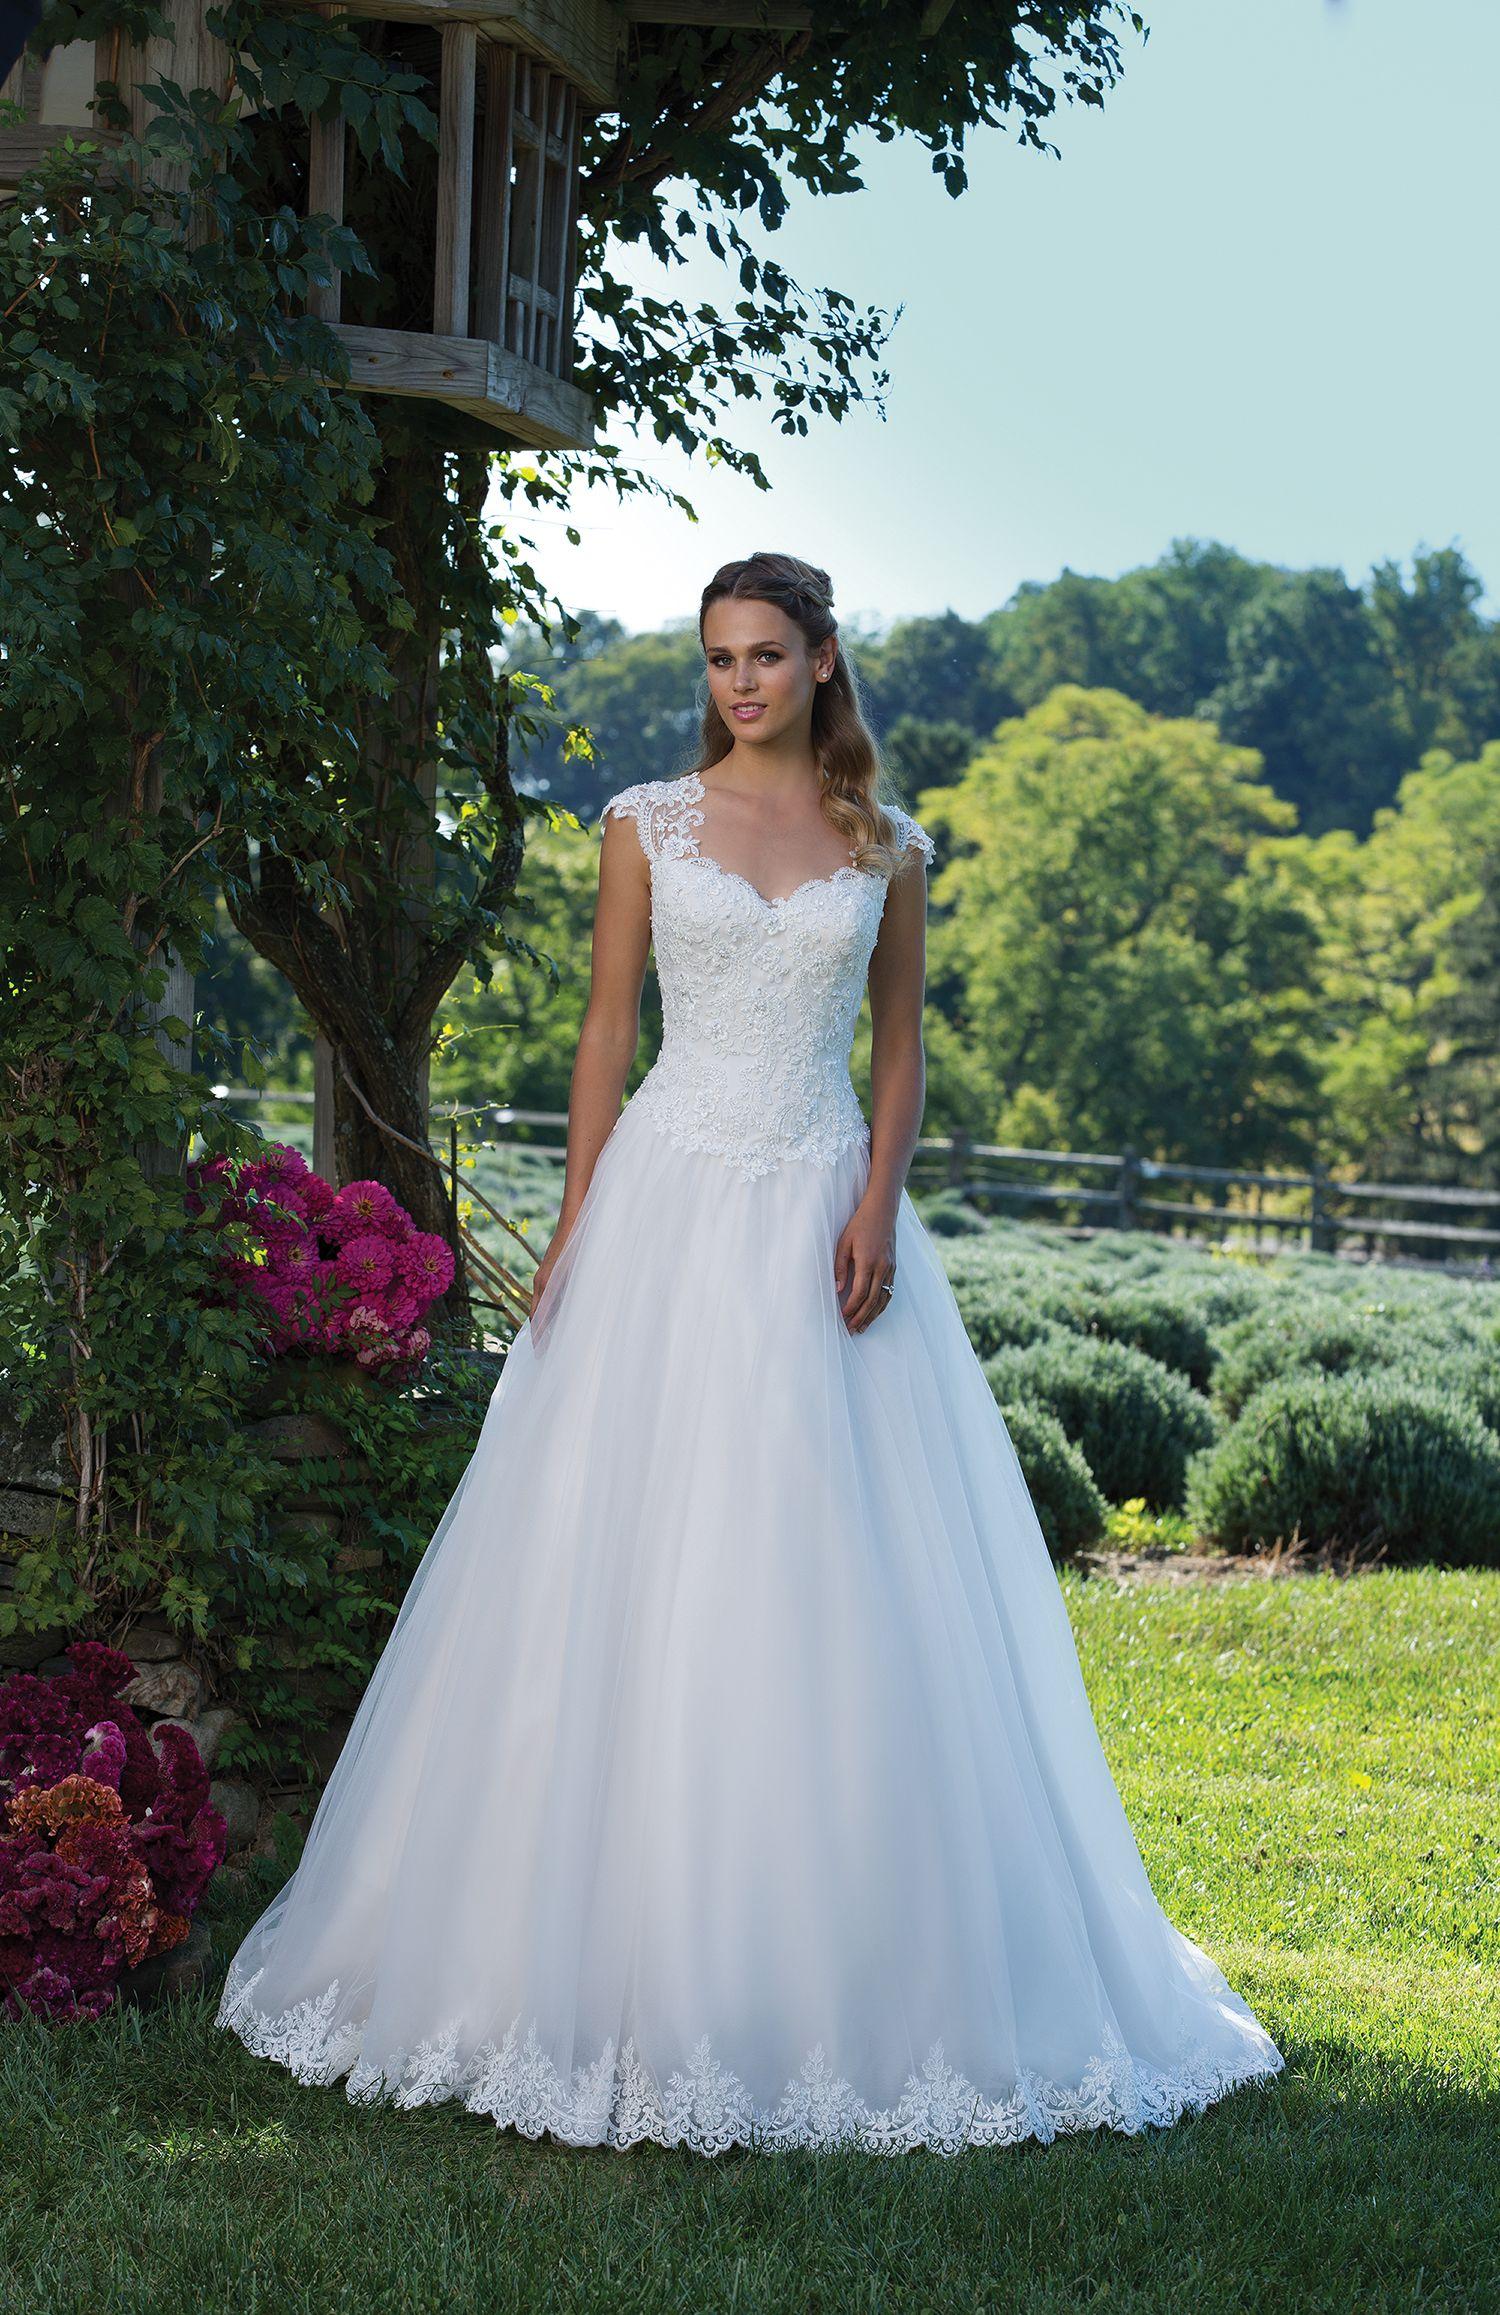 wedding #bride #weddingdress #bridal #bridalgown #sincerity ...